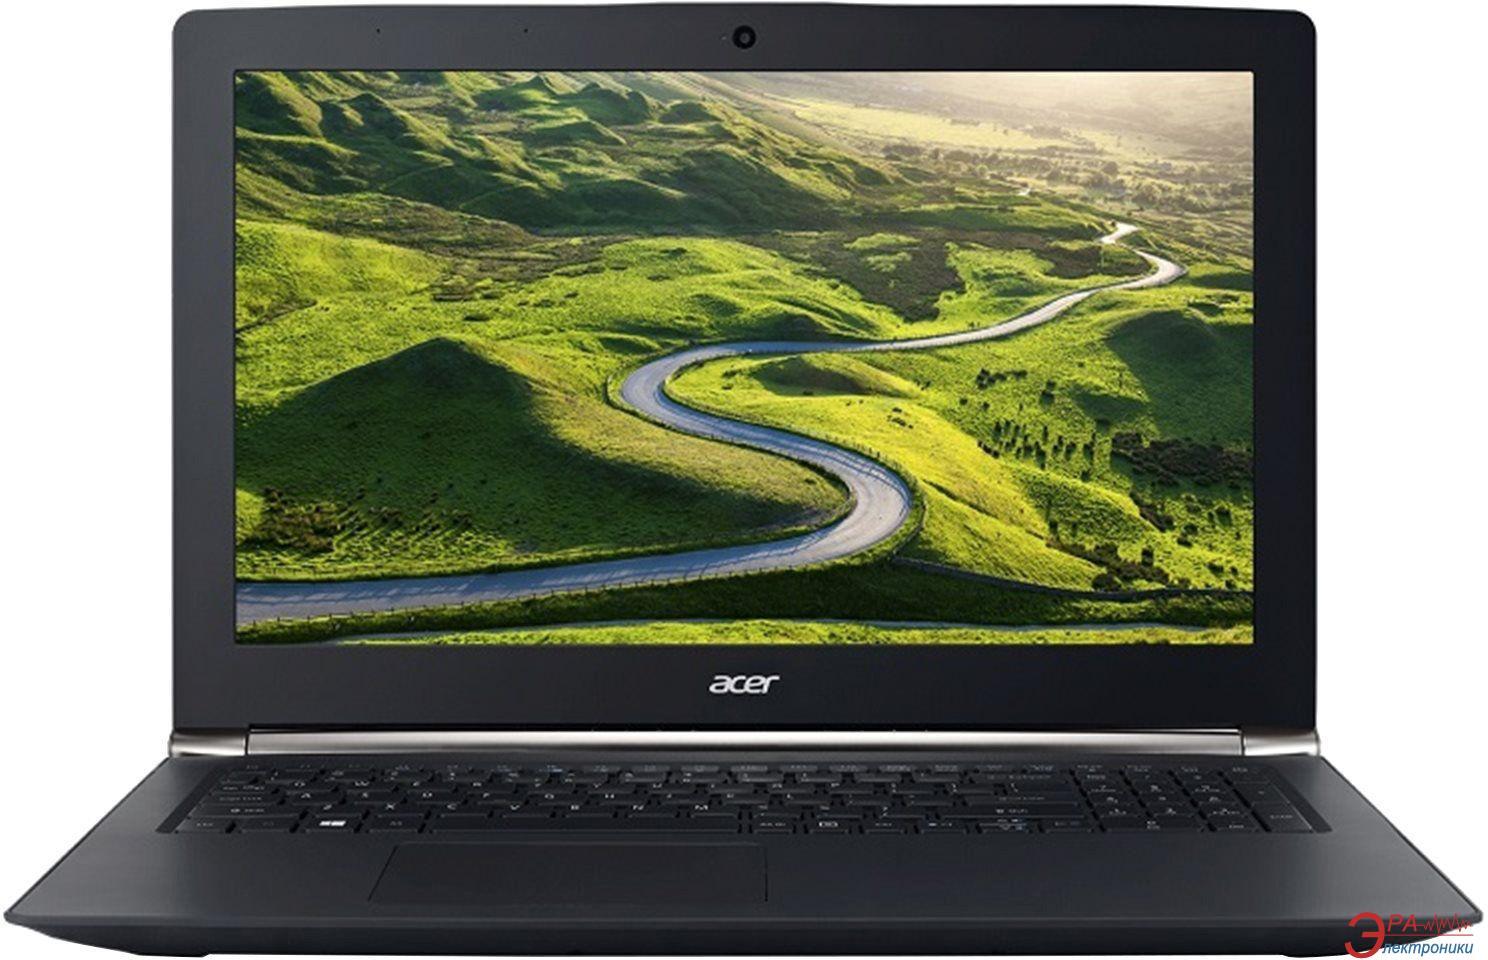 Ноутбук Acer Aspire Nitro VN7-572G-75HQ (NX.G6GEU.005) Black 15,6